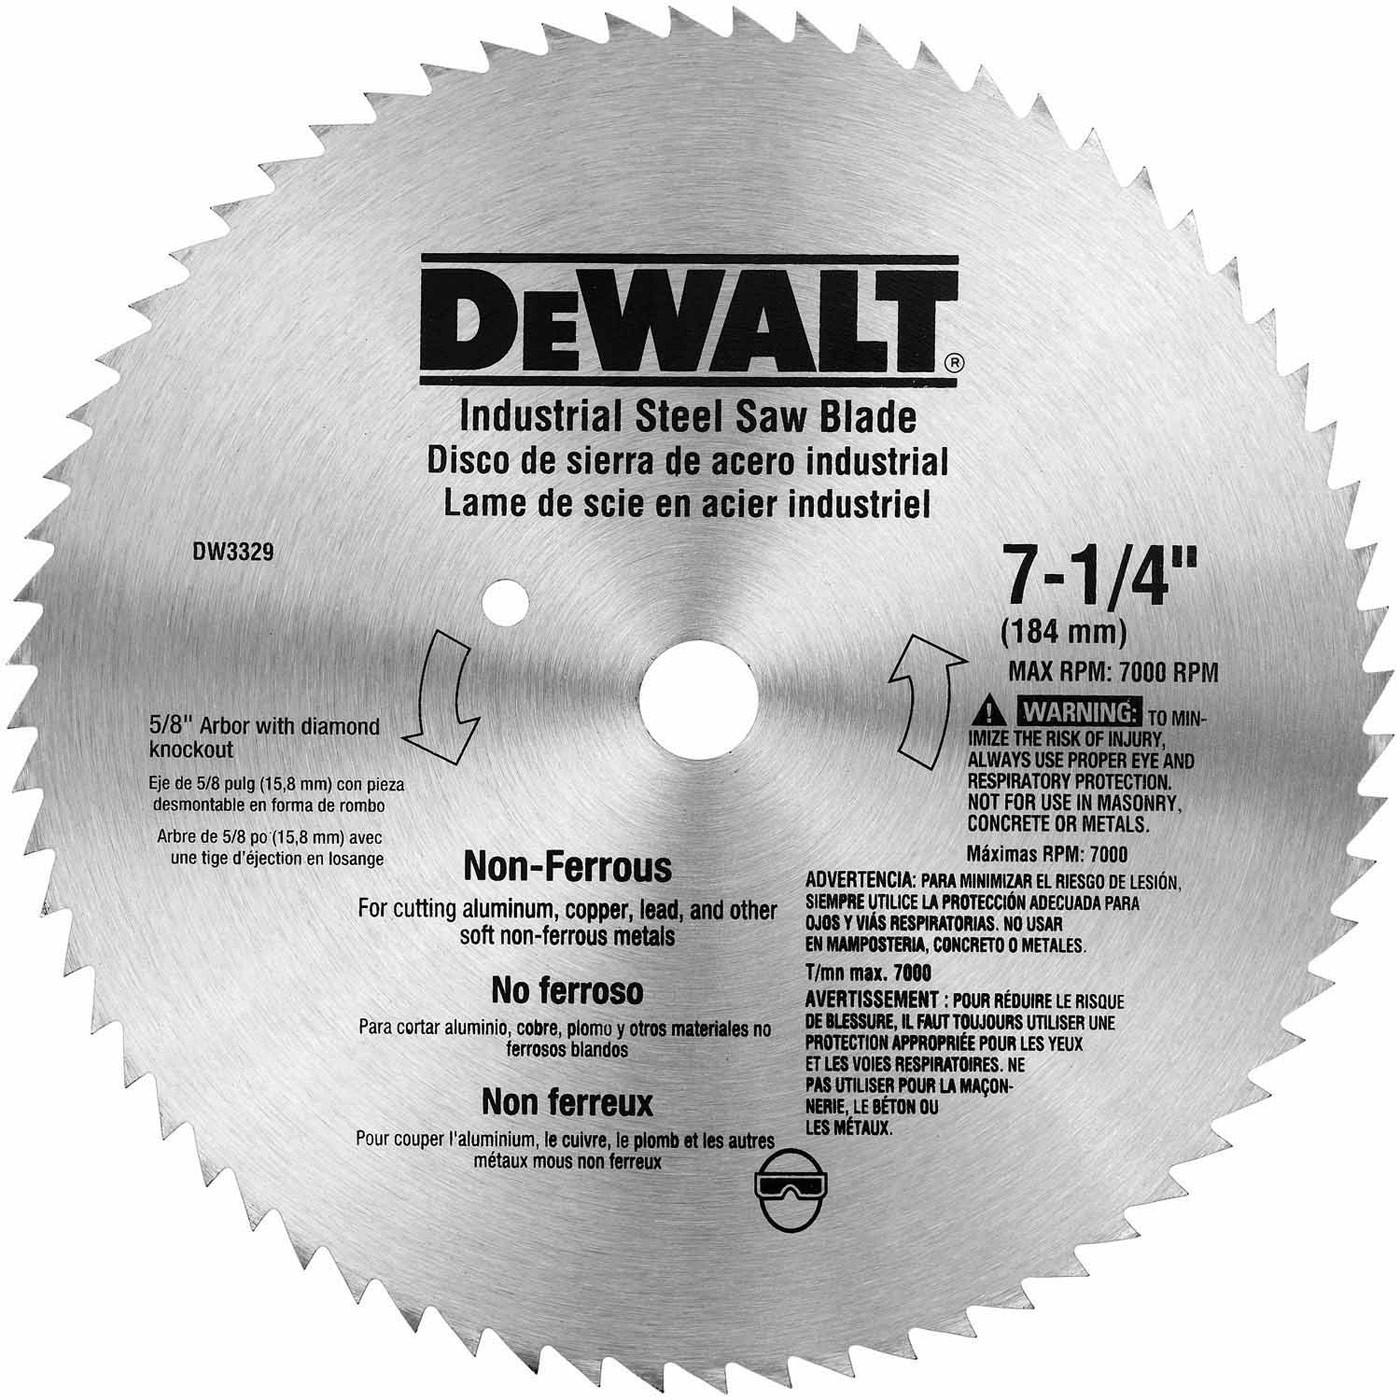 Tool accessories circular saw blades dewalt dw3329 7 14 68t steel non ferrous steel saw blade greentooth Gallery